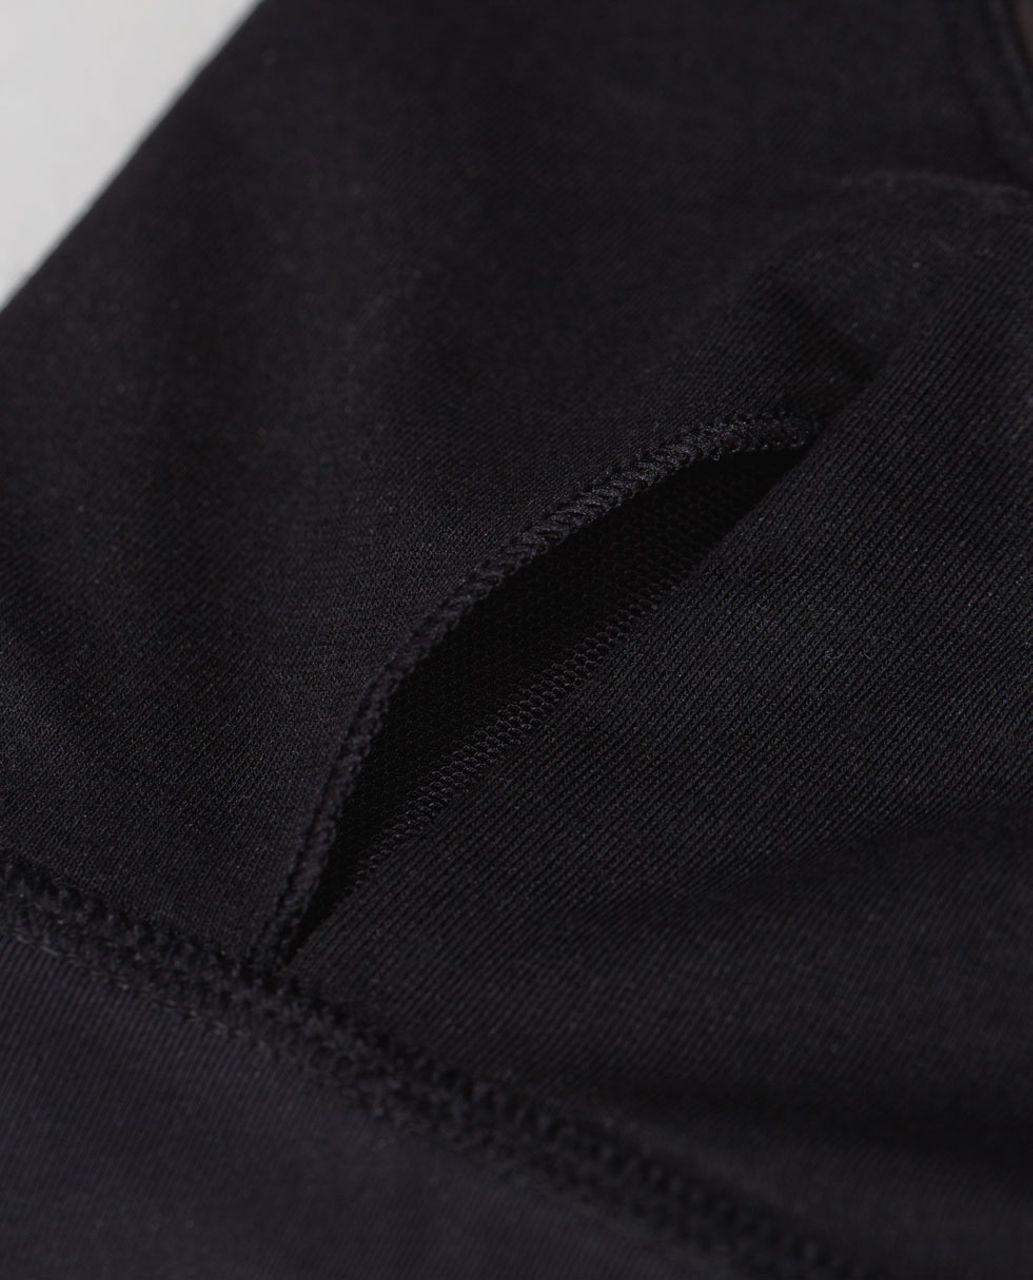 Lululemon Energy Bra - Savasana Camo 20cm New Black